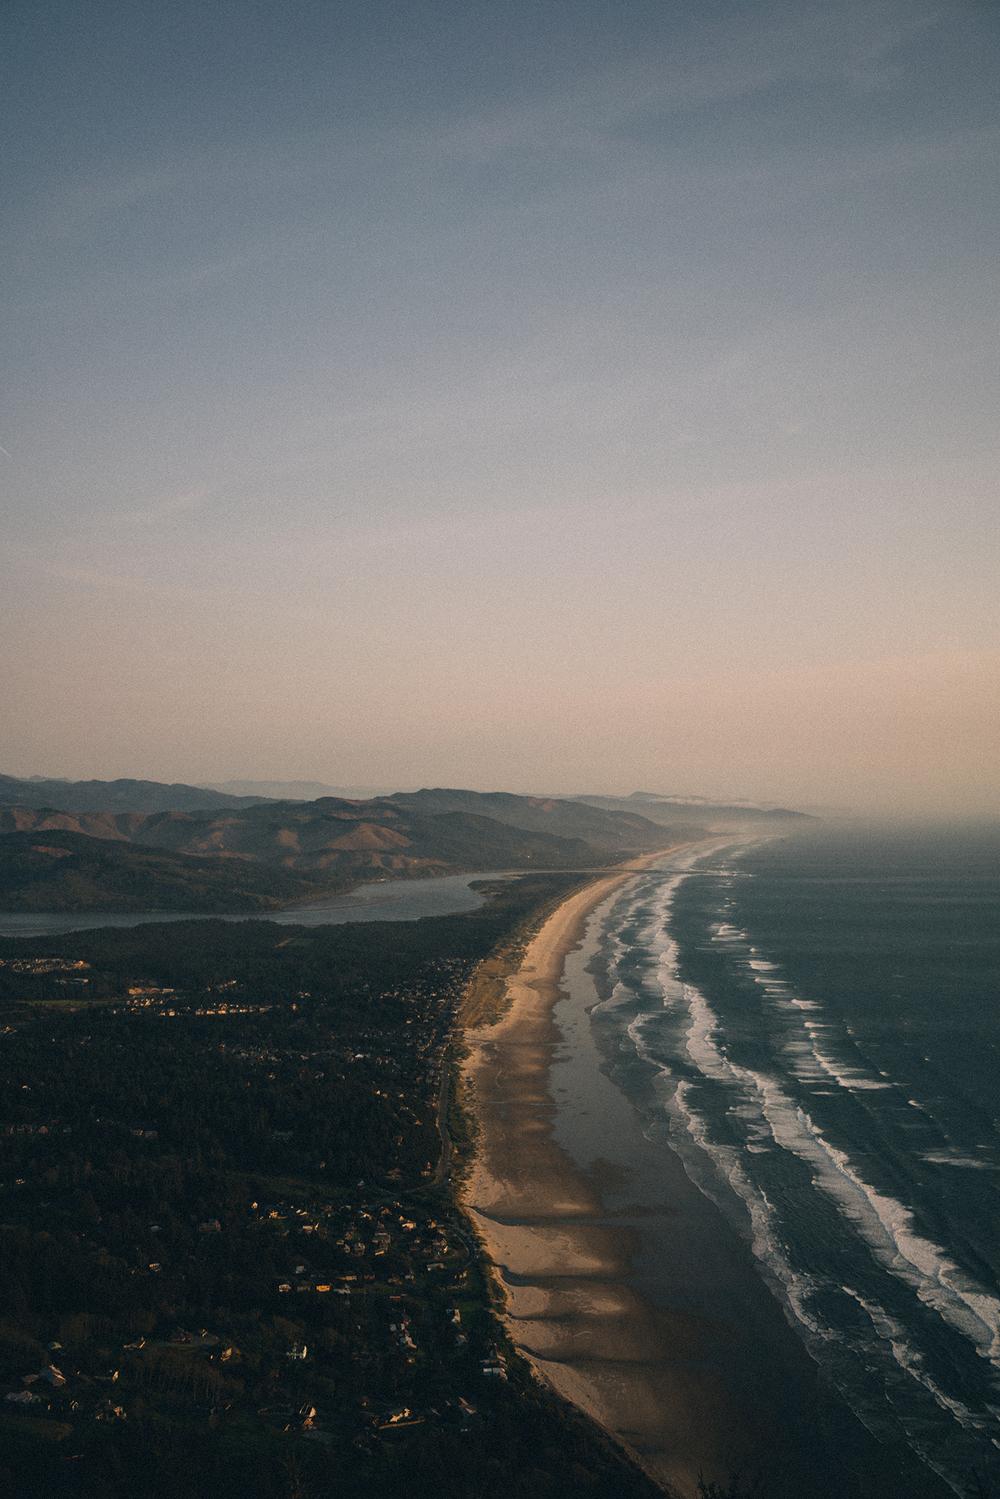 Looking down at the Oregon Coastline.